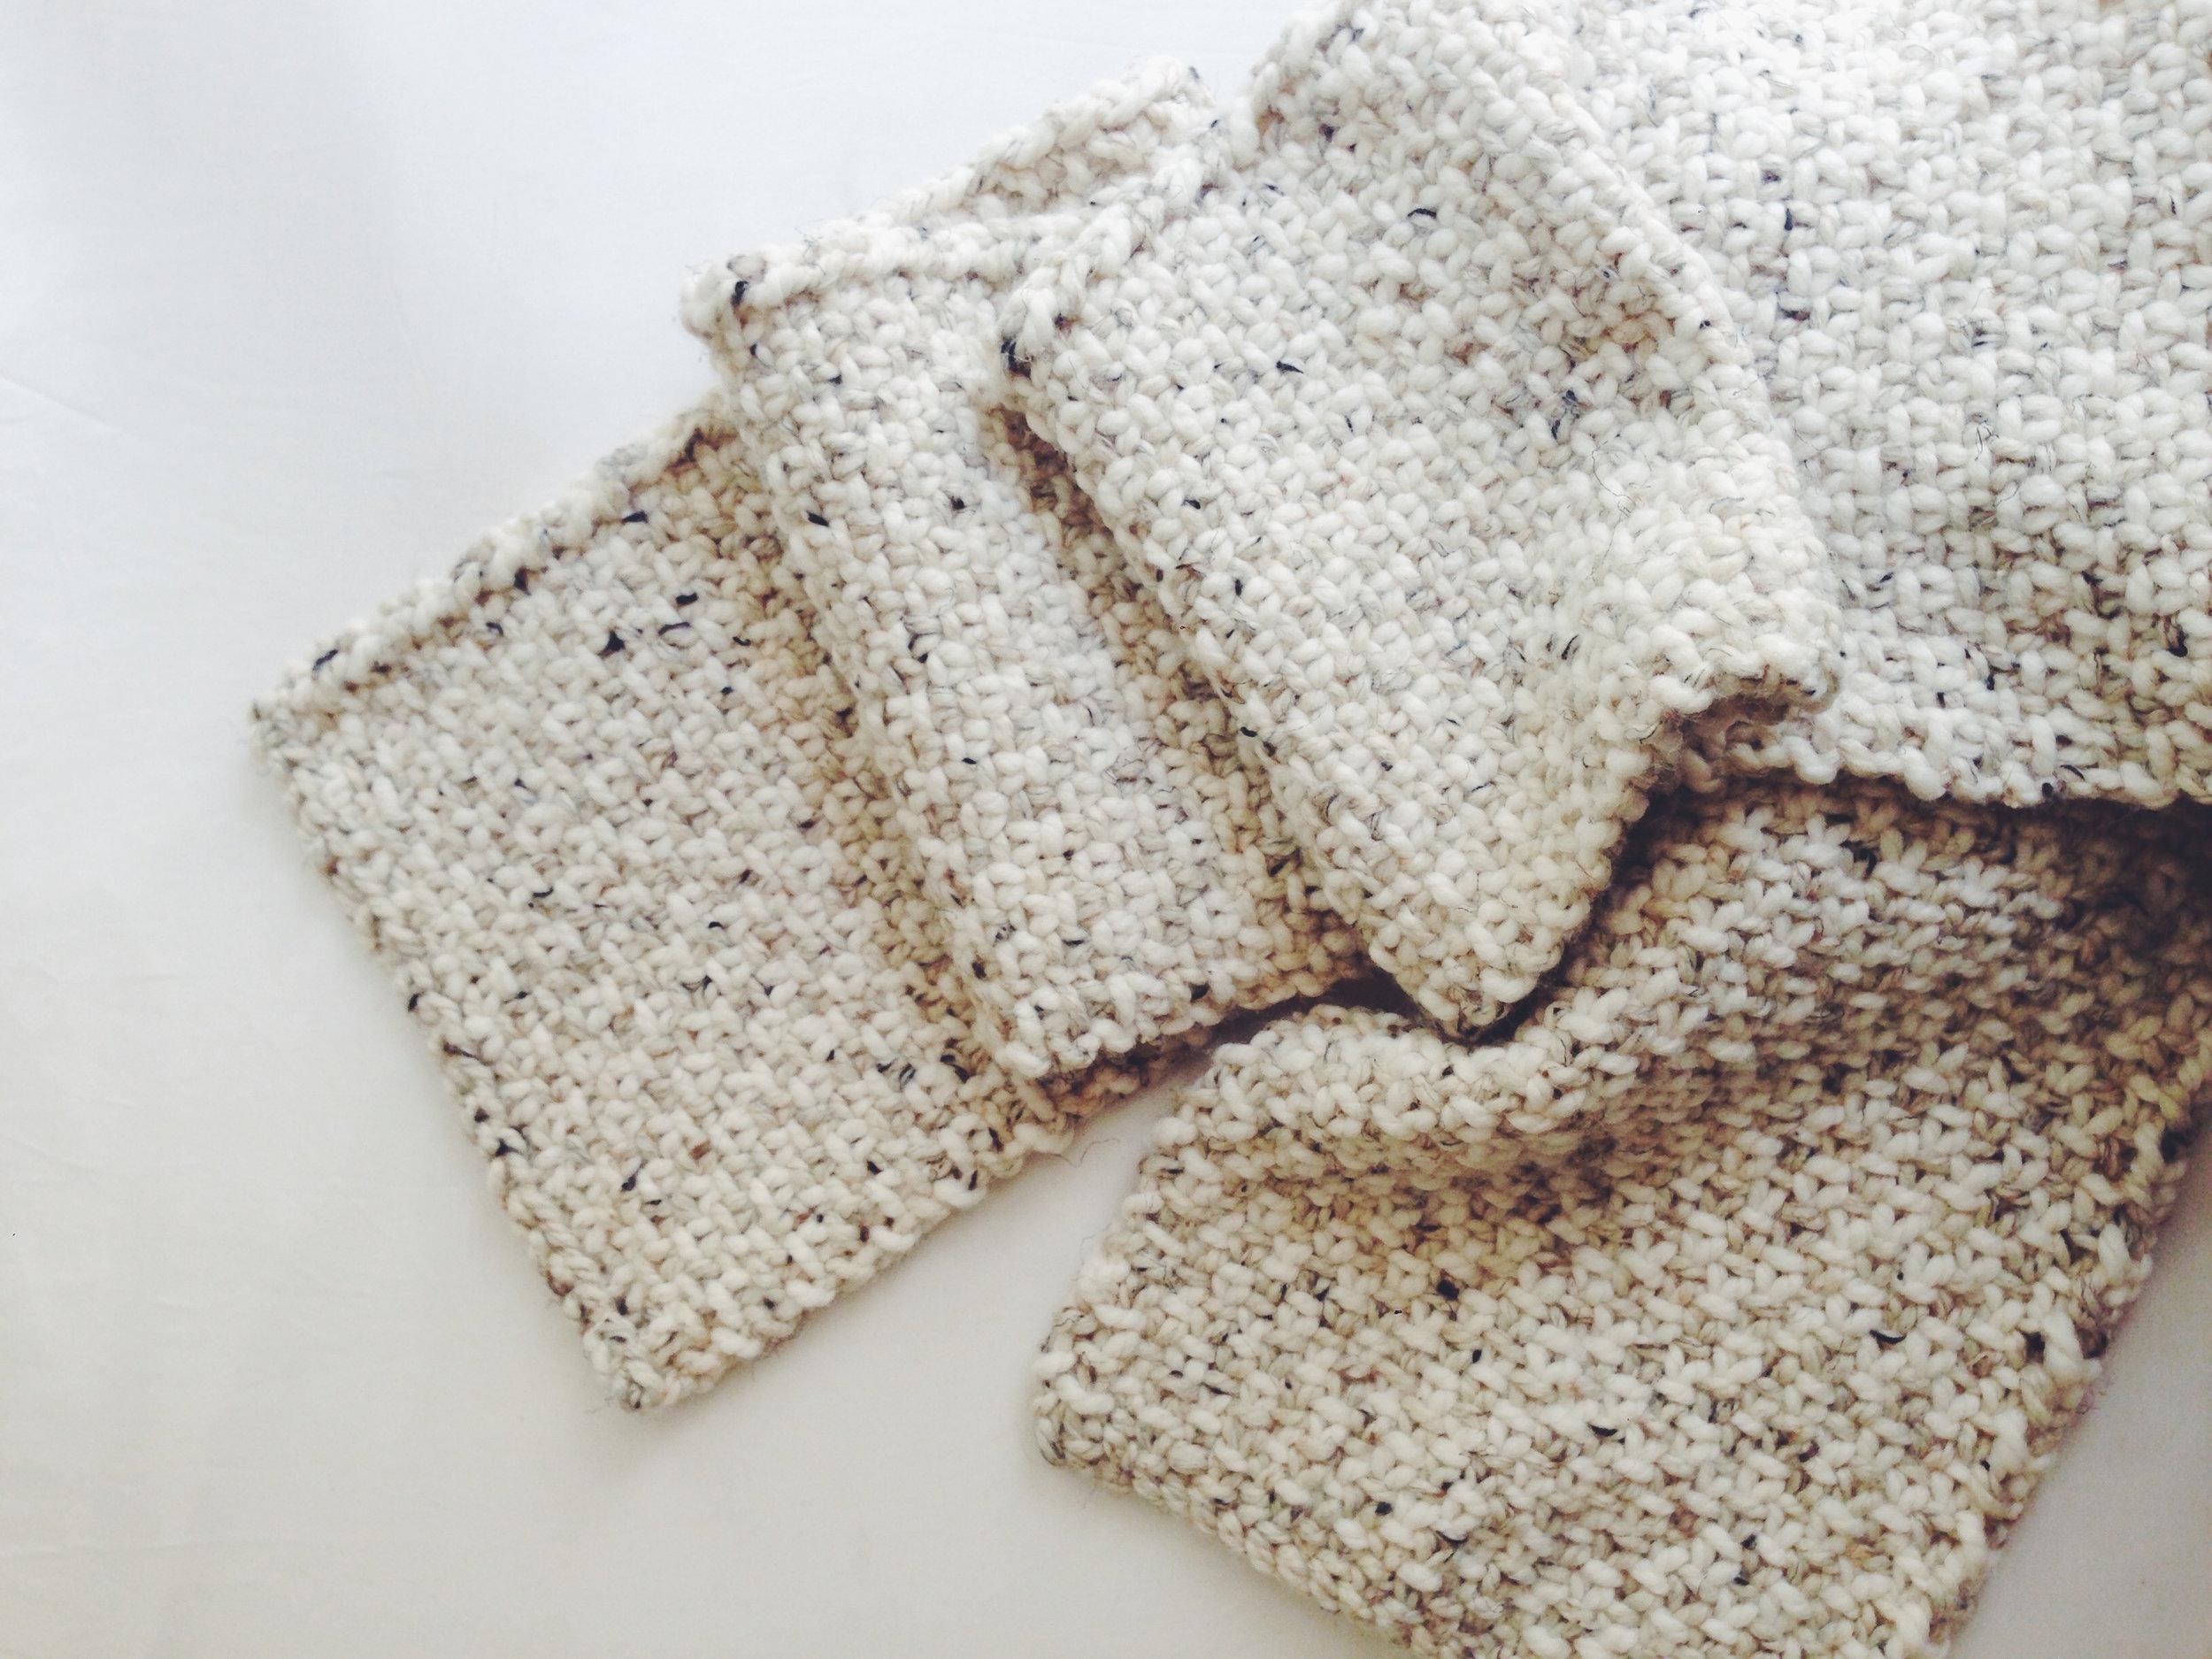 Two of Wands knitwear